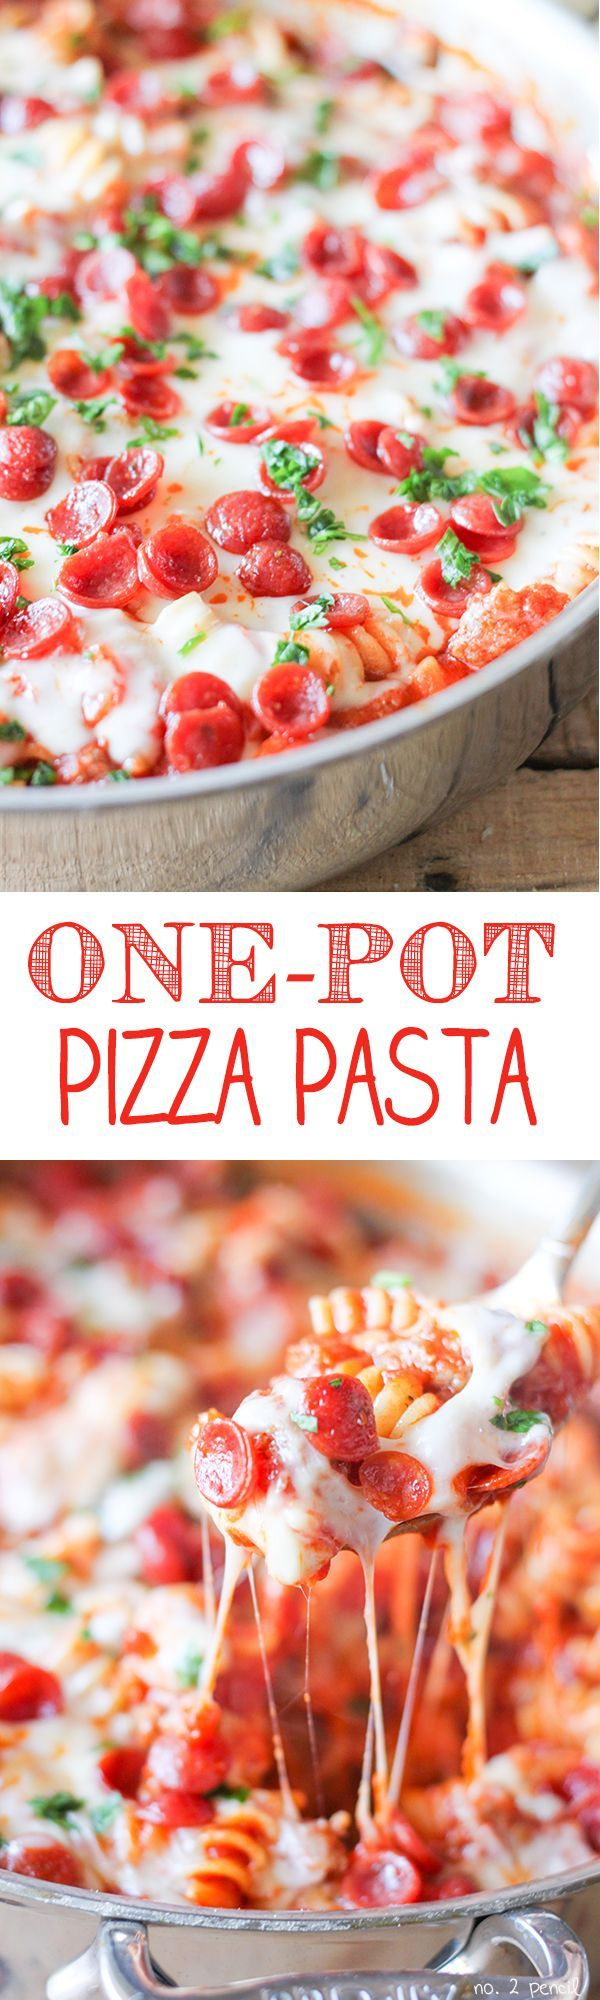 One-Pot Pizza Pasta - Easy one-pot dinner idea!